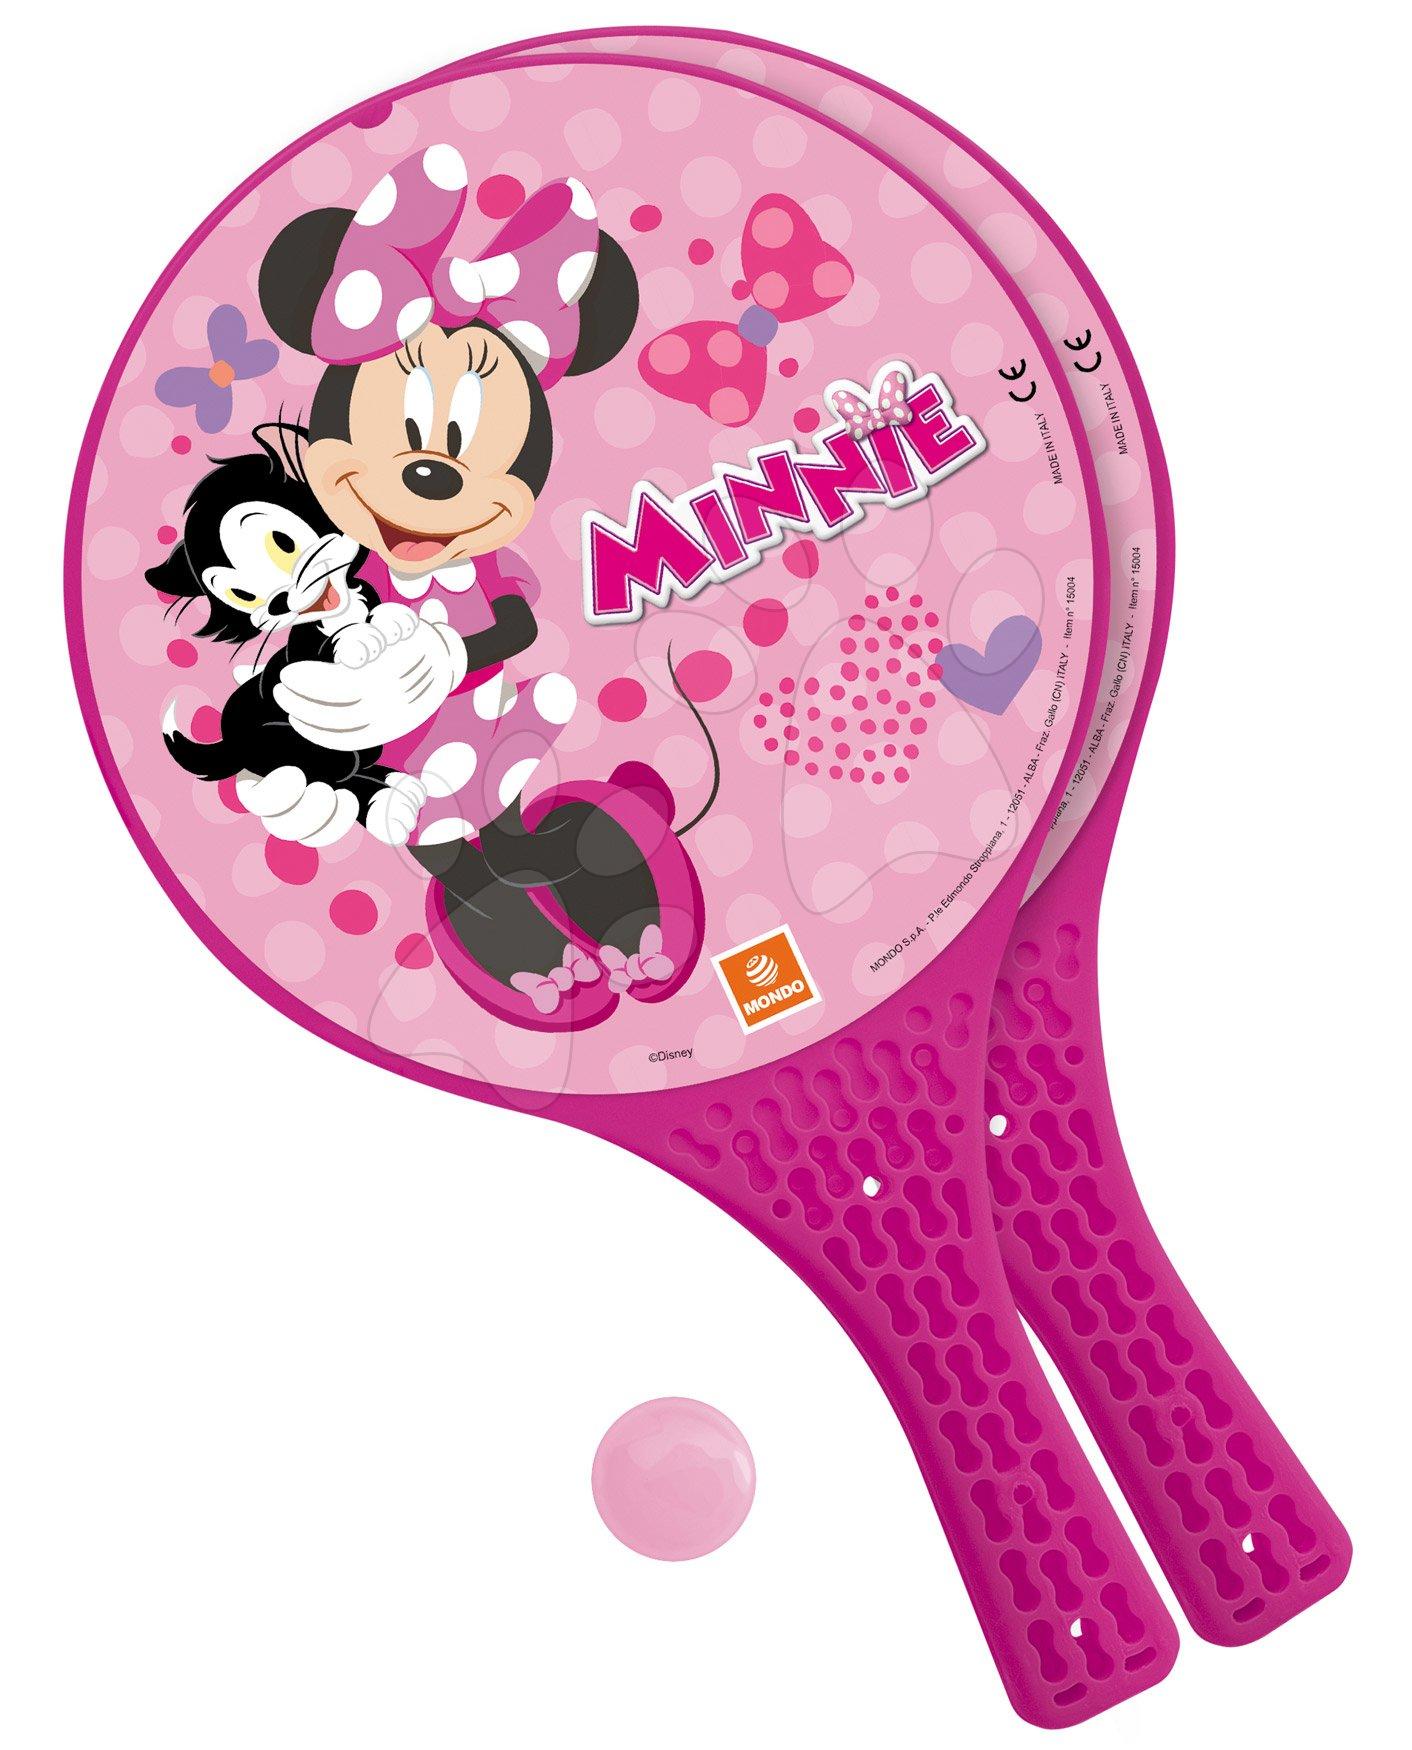 Tenis - Plážový tenis set Minnie Mondo s 2 raketami a loptičkou